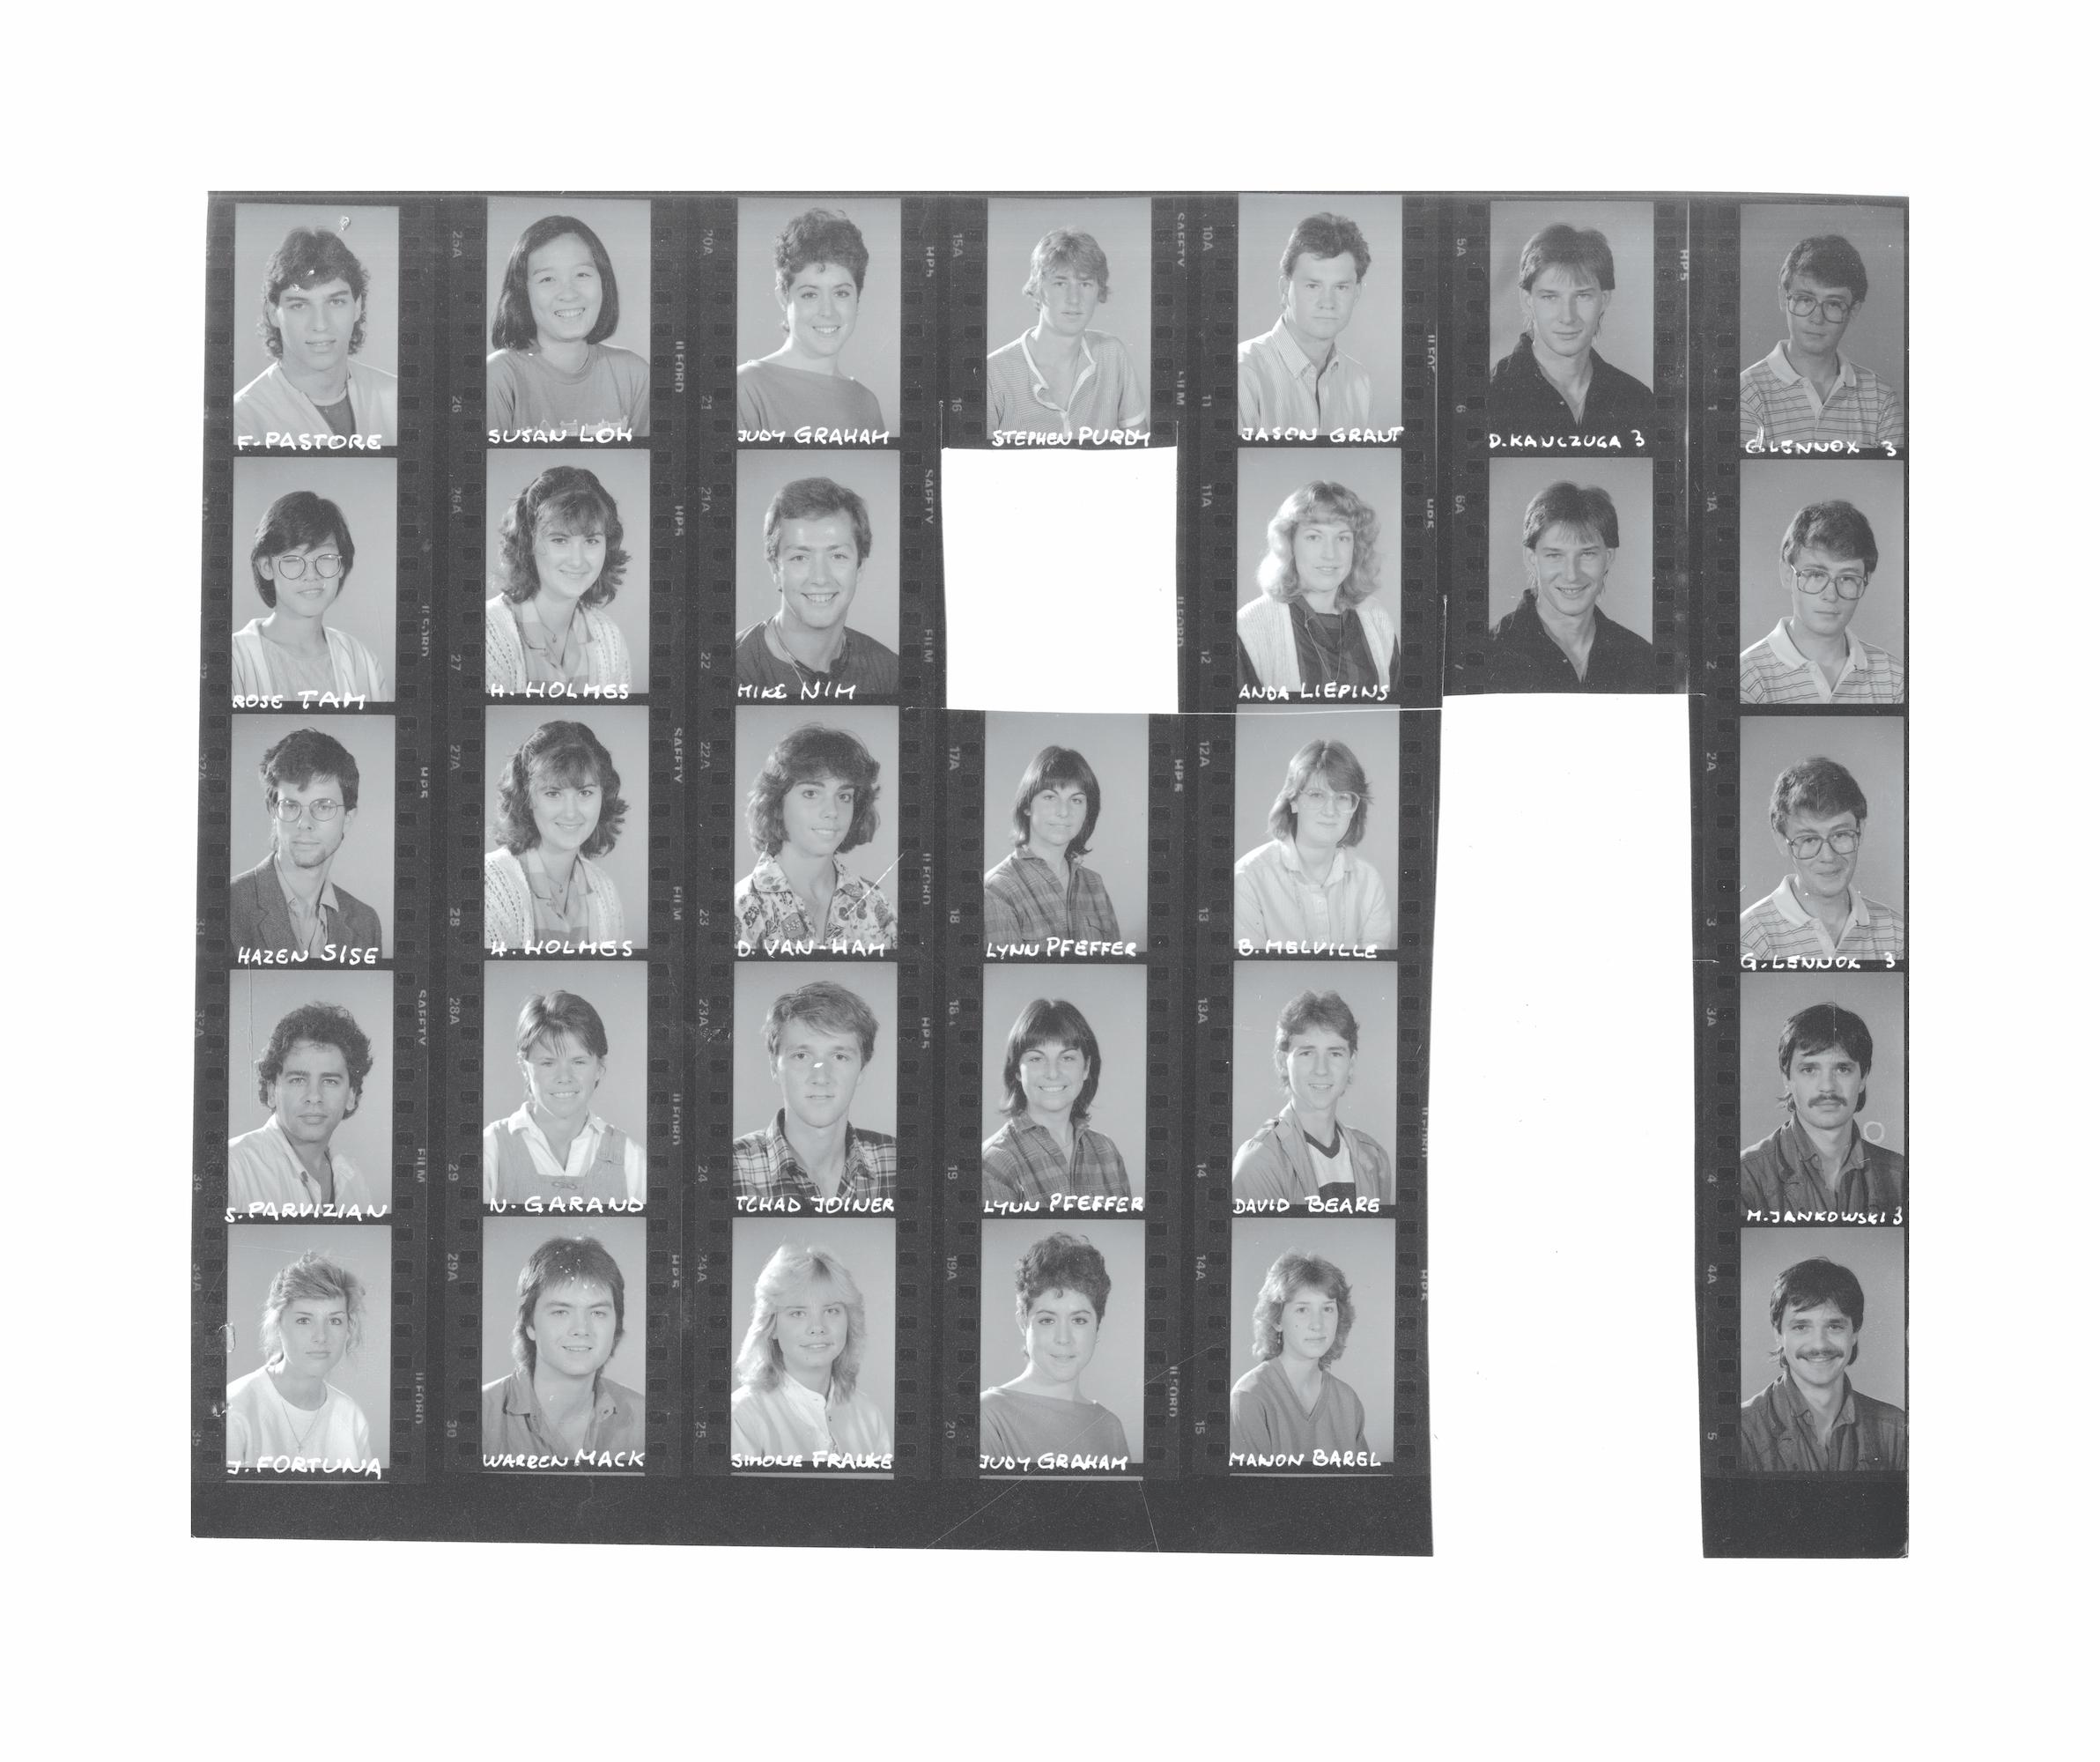 11_1985-86